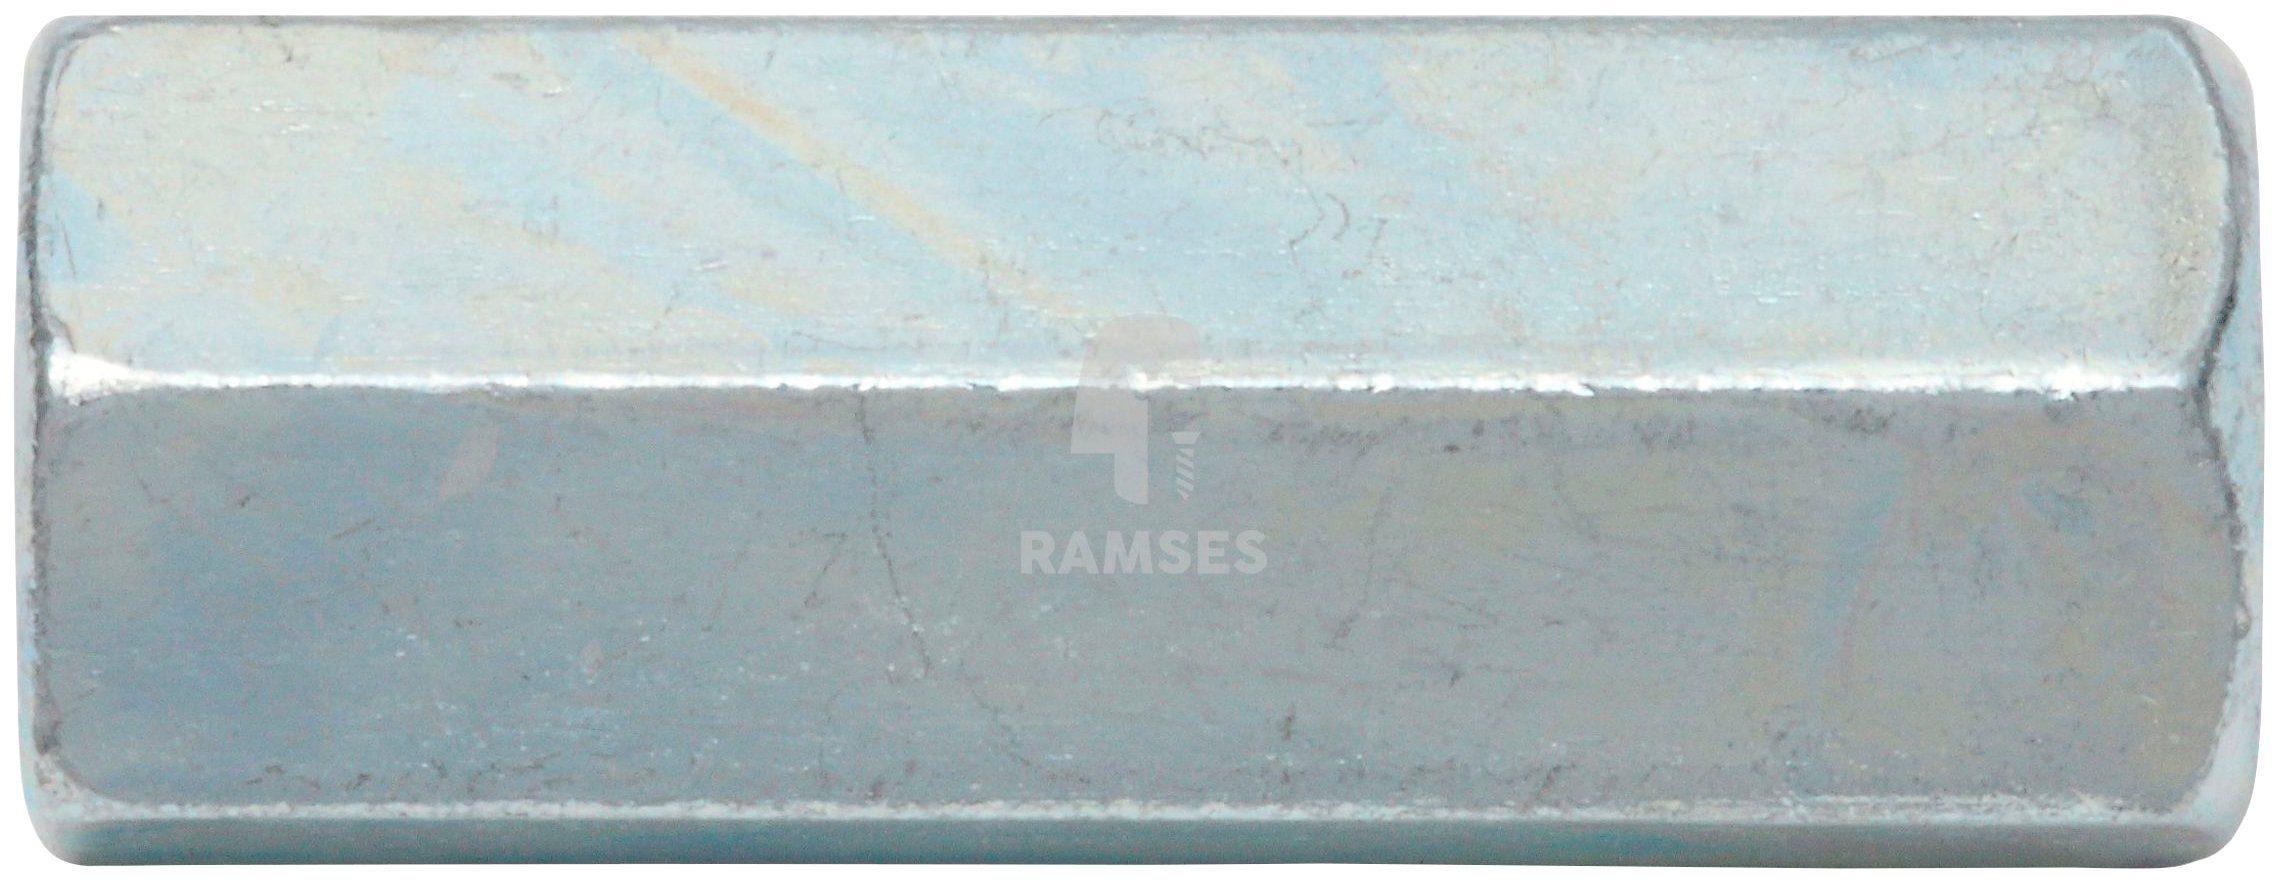 RAMSES Muffe , Sechskant Gewindemuffe M6 X 25